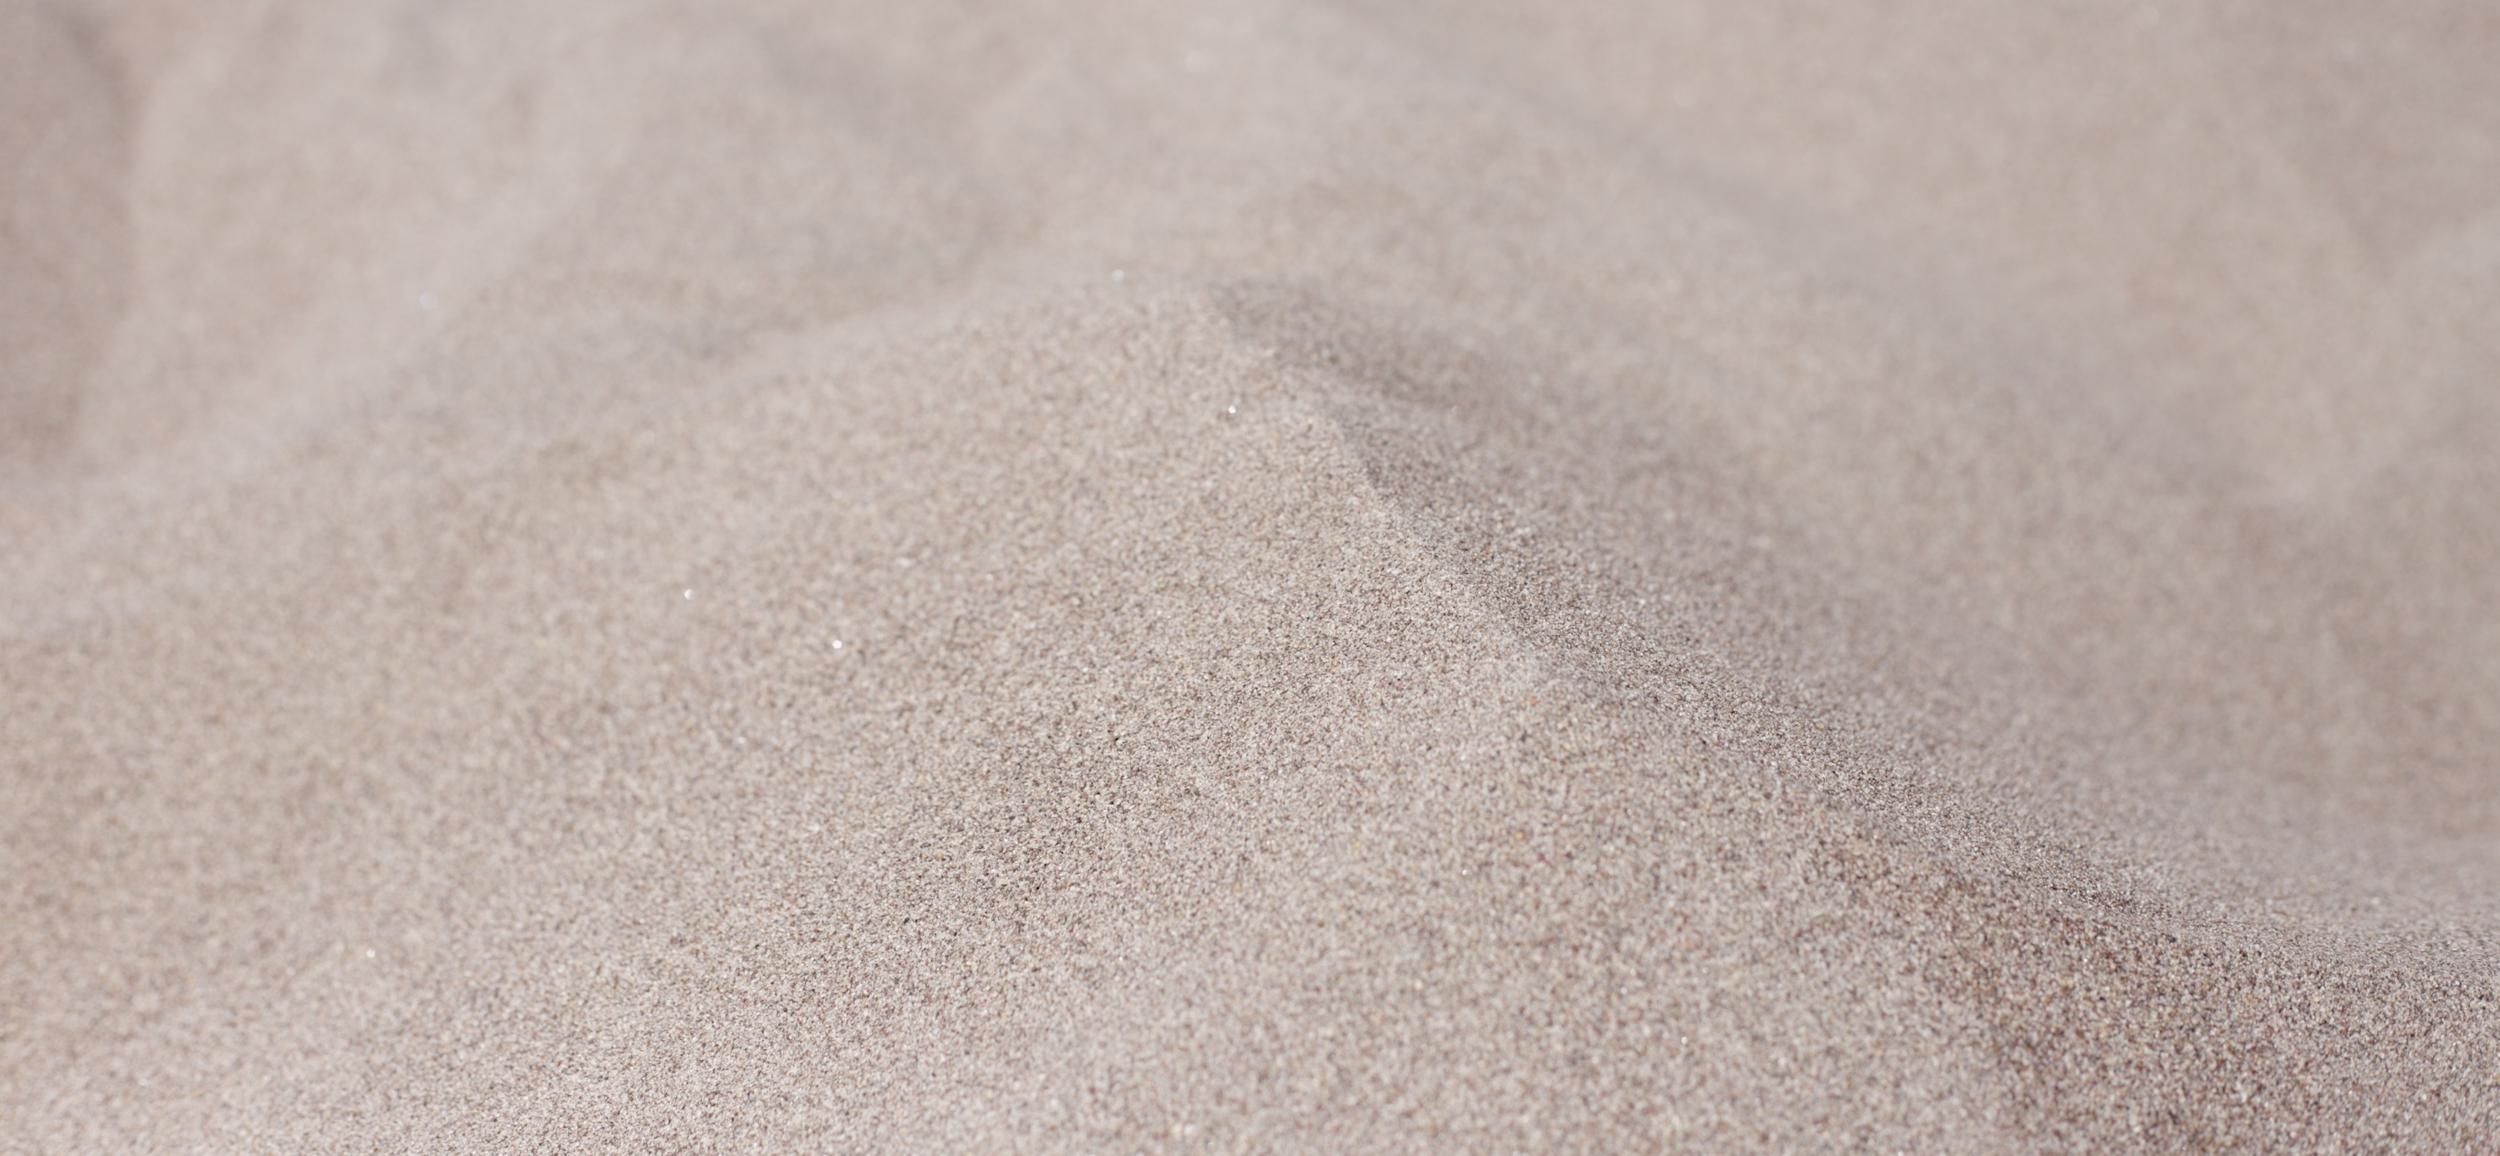 Grains of sand at Sand Dunes national park.